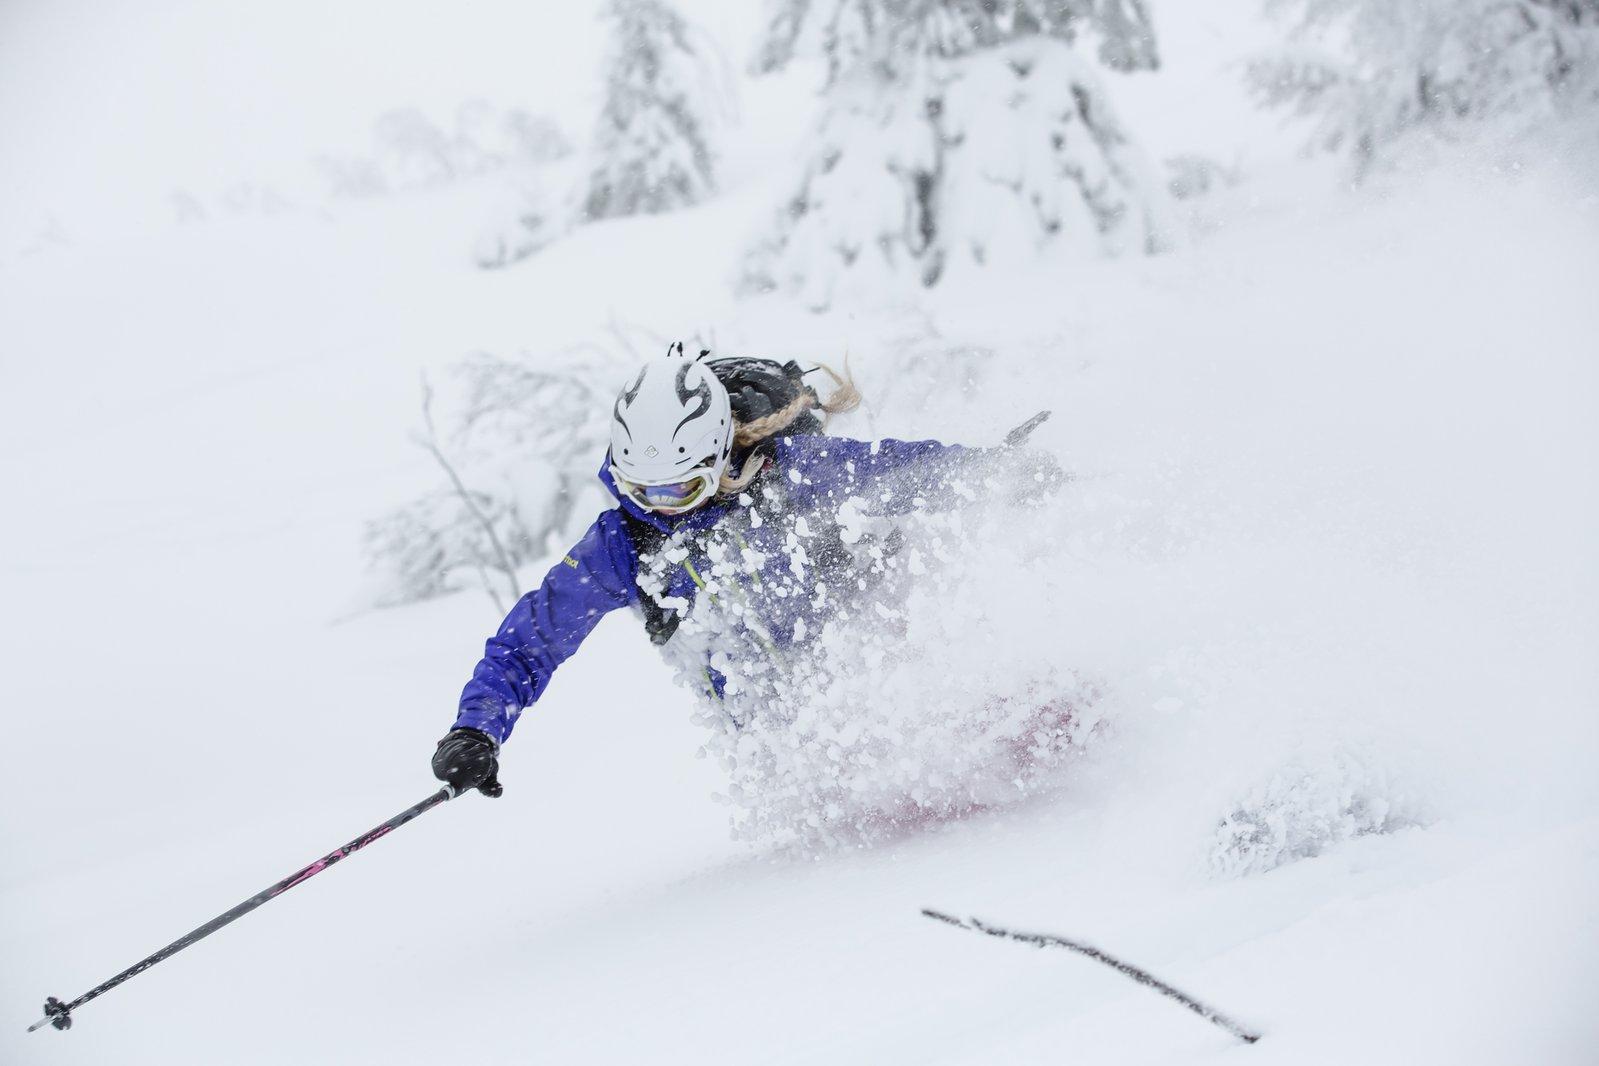 agressive pow skiiing in norway!b